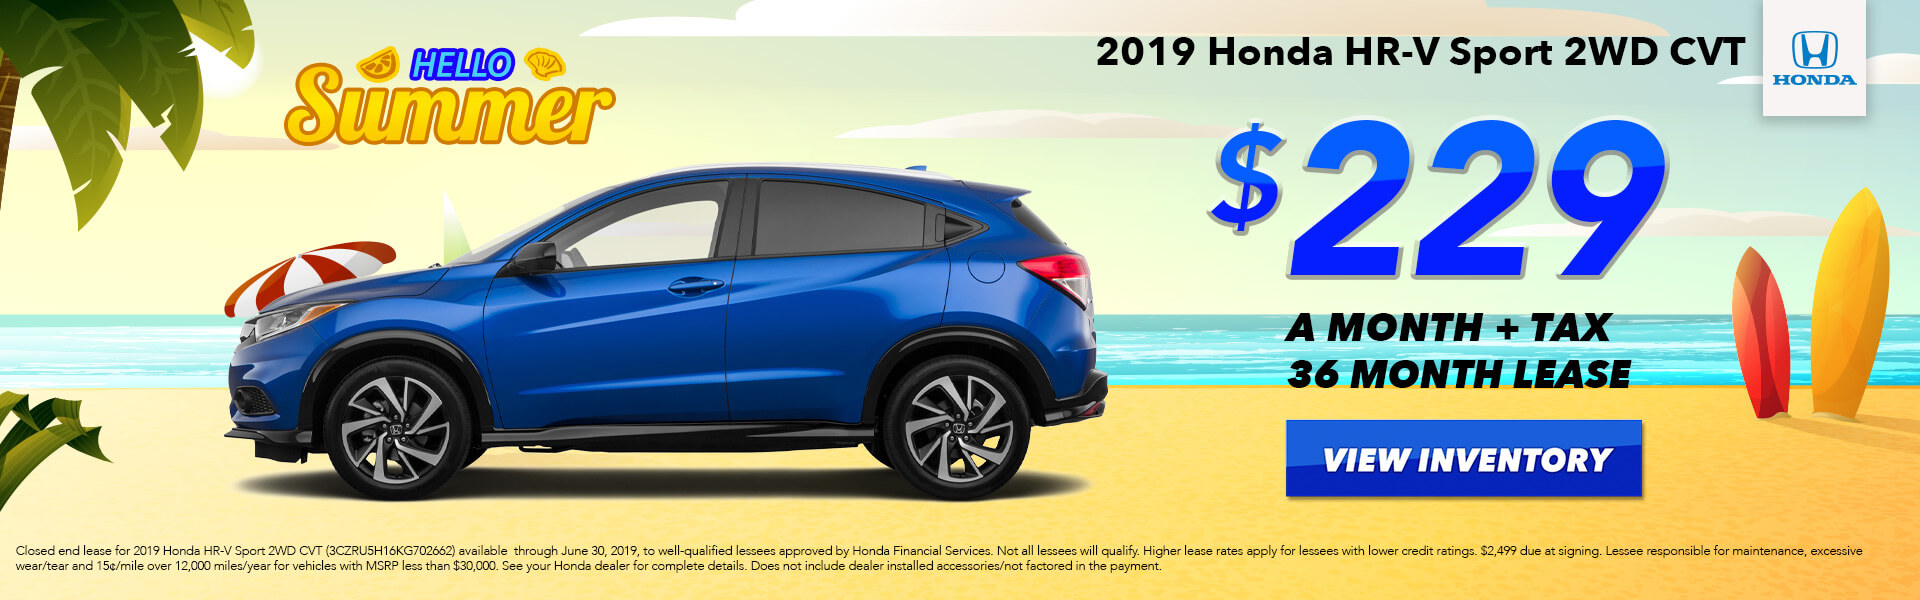 HR-V Sport Lease $229